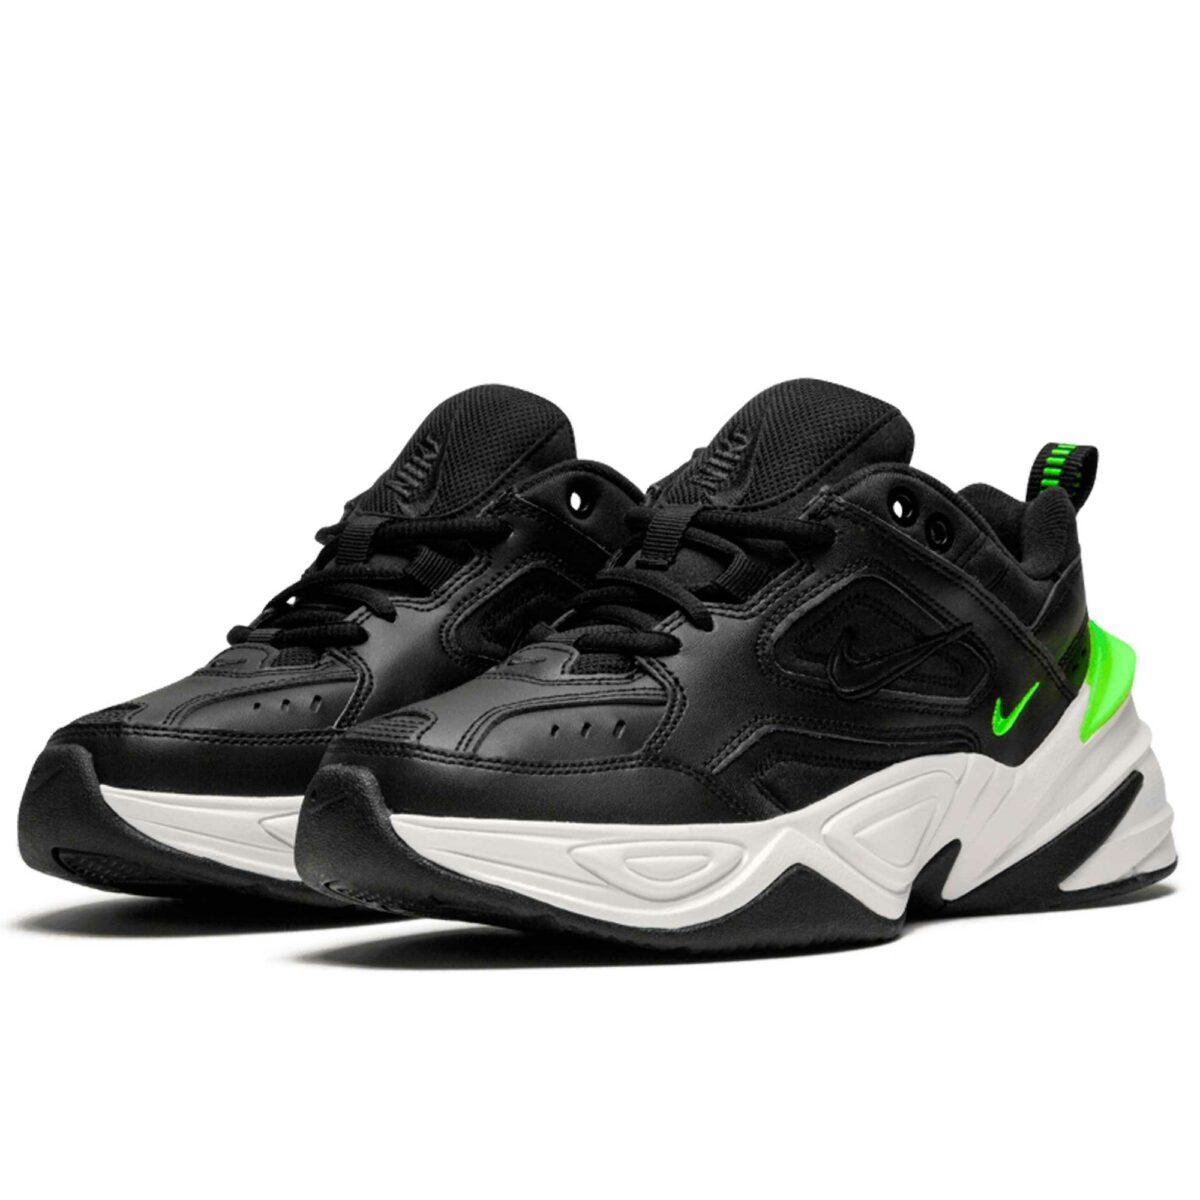 nike m2k tekno sneakers ao3108_002 купить